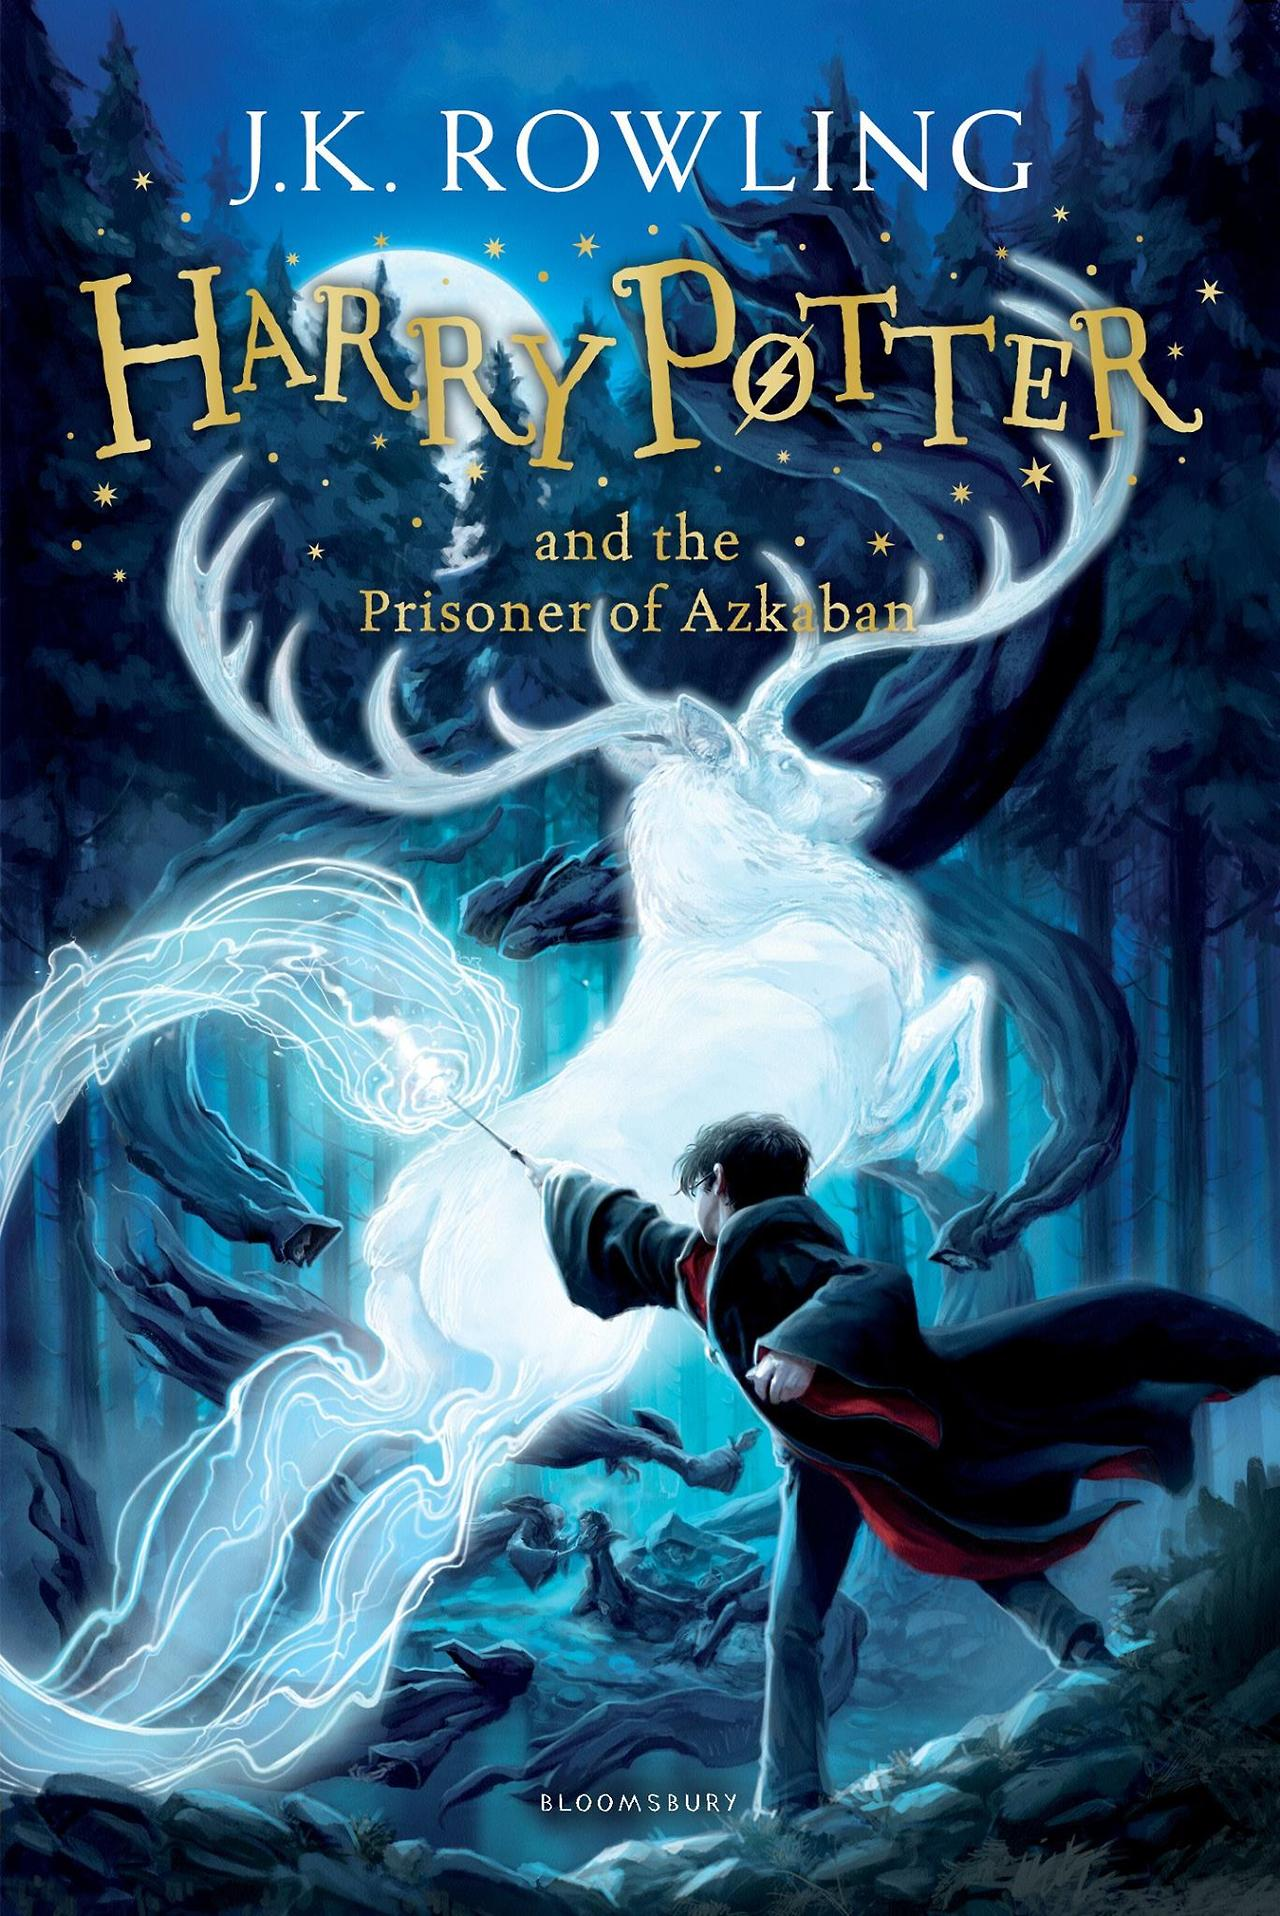 Harry Potter And The Prisoner Of Azkaban Harry Potter 3 By Jk Rowling